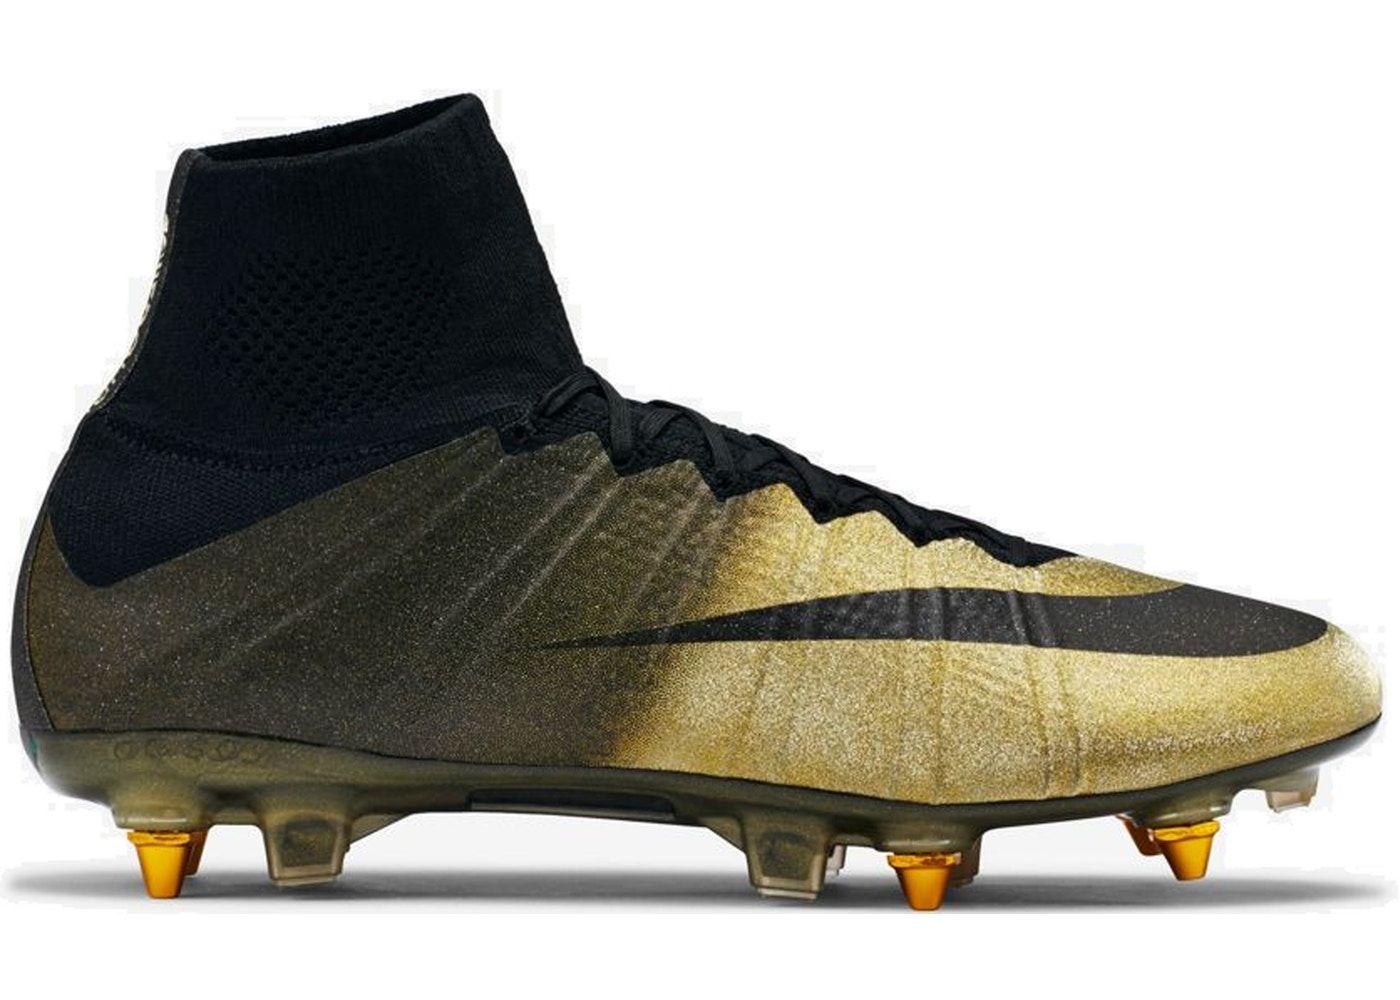 Nike Mercurial Superfly Cr7 Cristiano Ronaldo Rare Gold In 2020 Nike Football Boots Cristiano Ronaldo Ronaldo